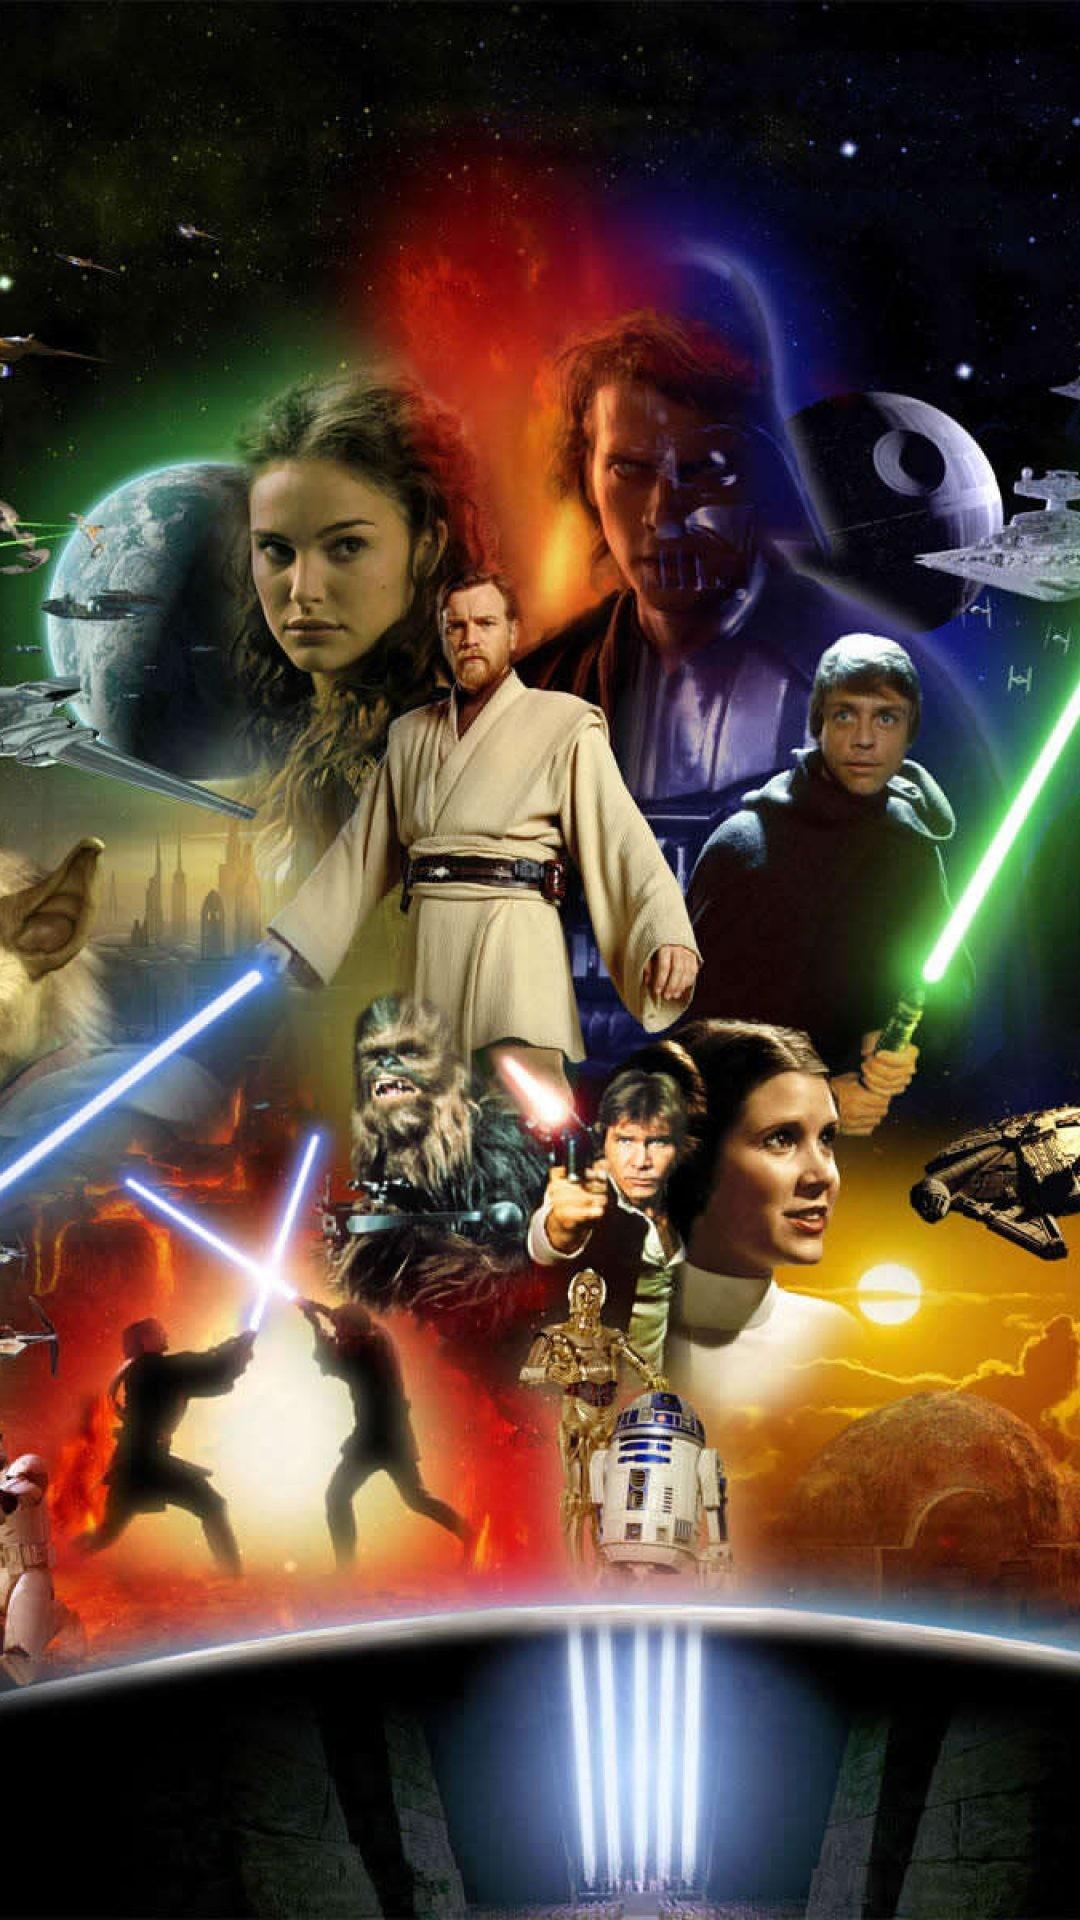 epic star wars wallpaper